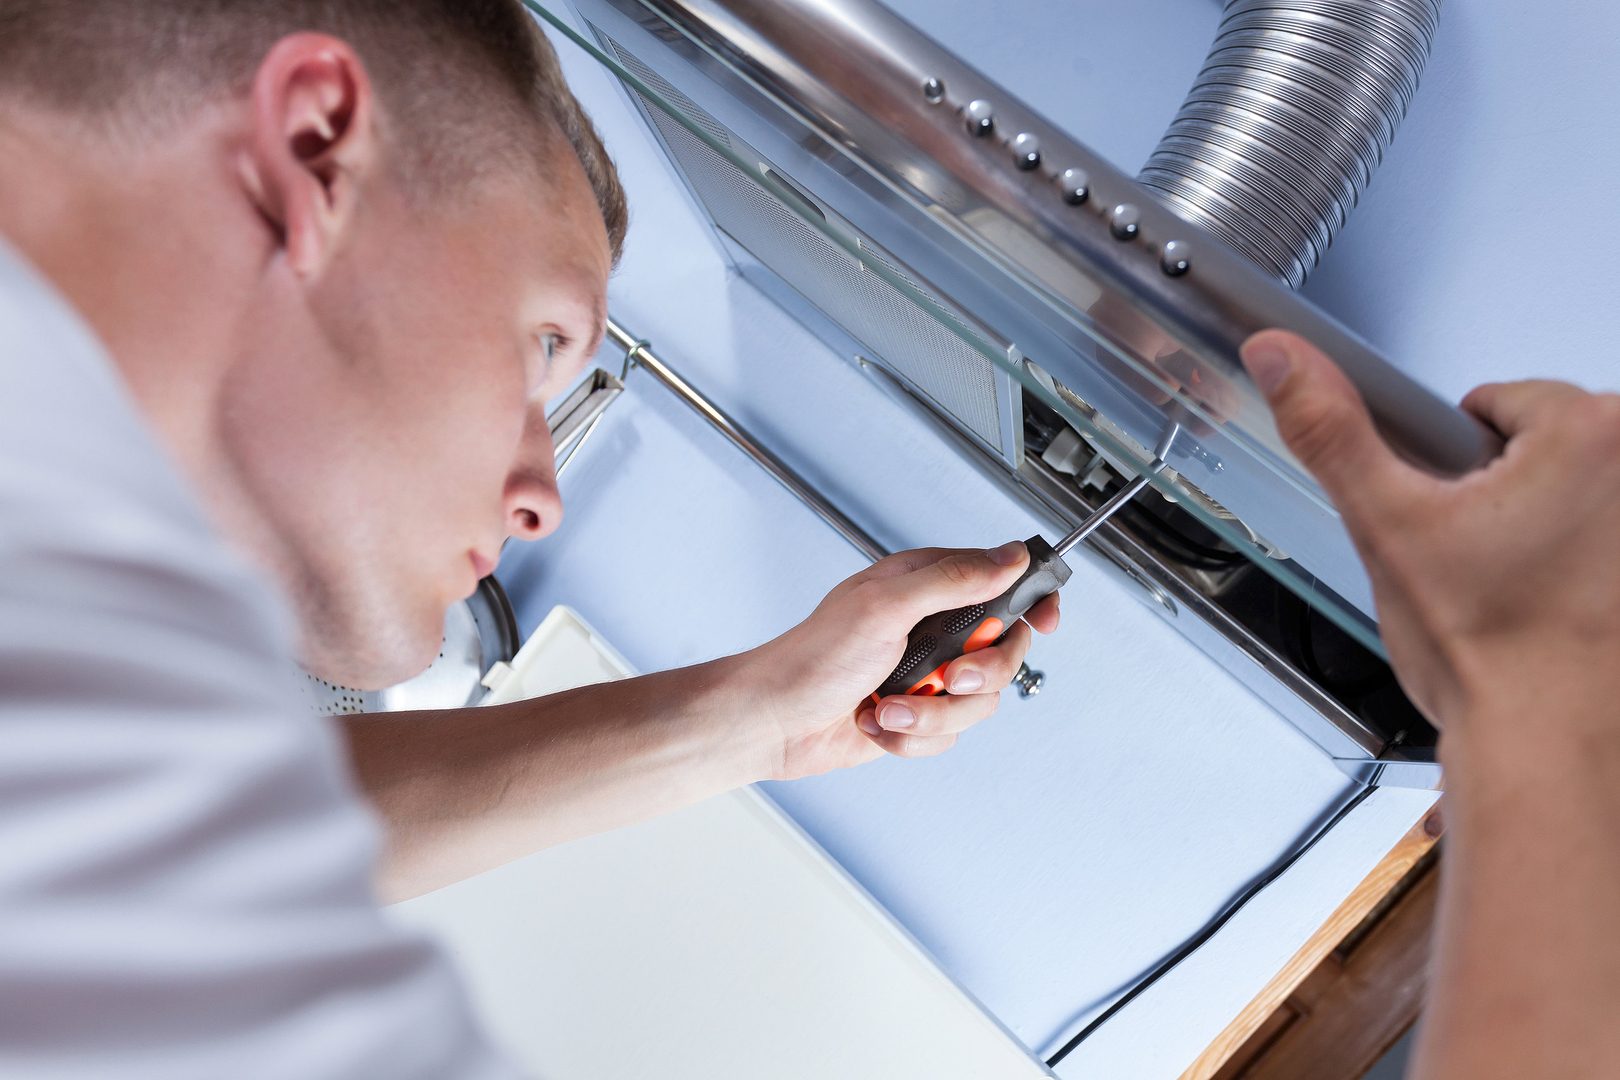 Gas Range Repair Service Gas Stove Repair Service Hm Electrical Services